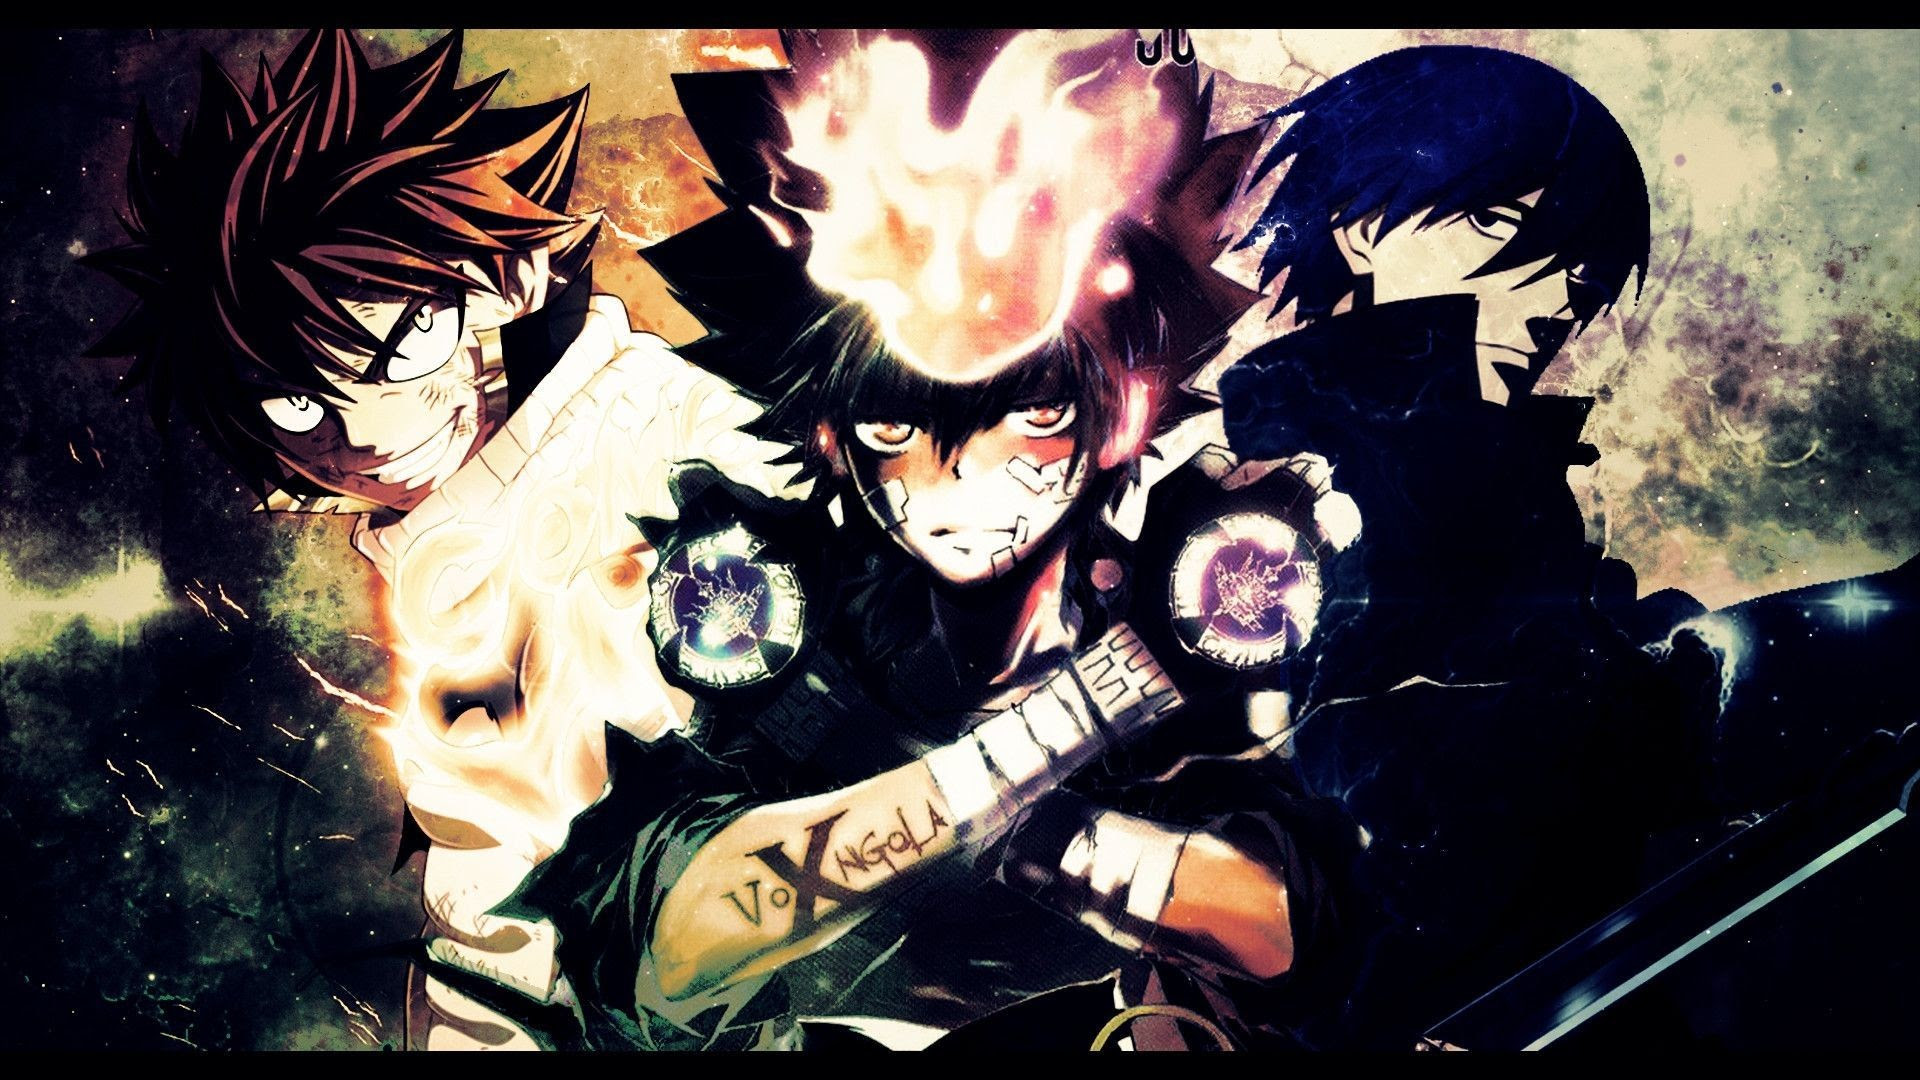 101+ Gambar Anime Keren Kualitas Hd Terbaik